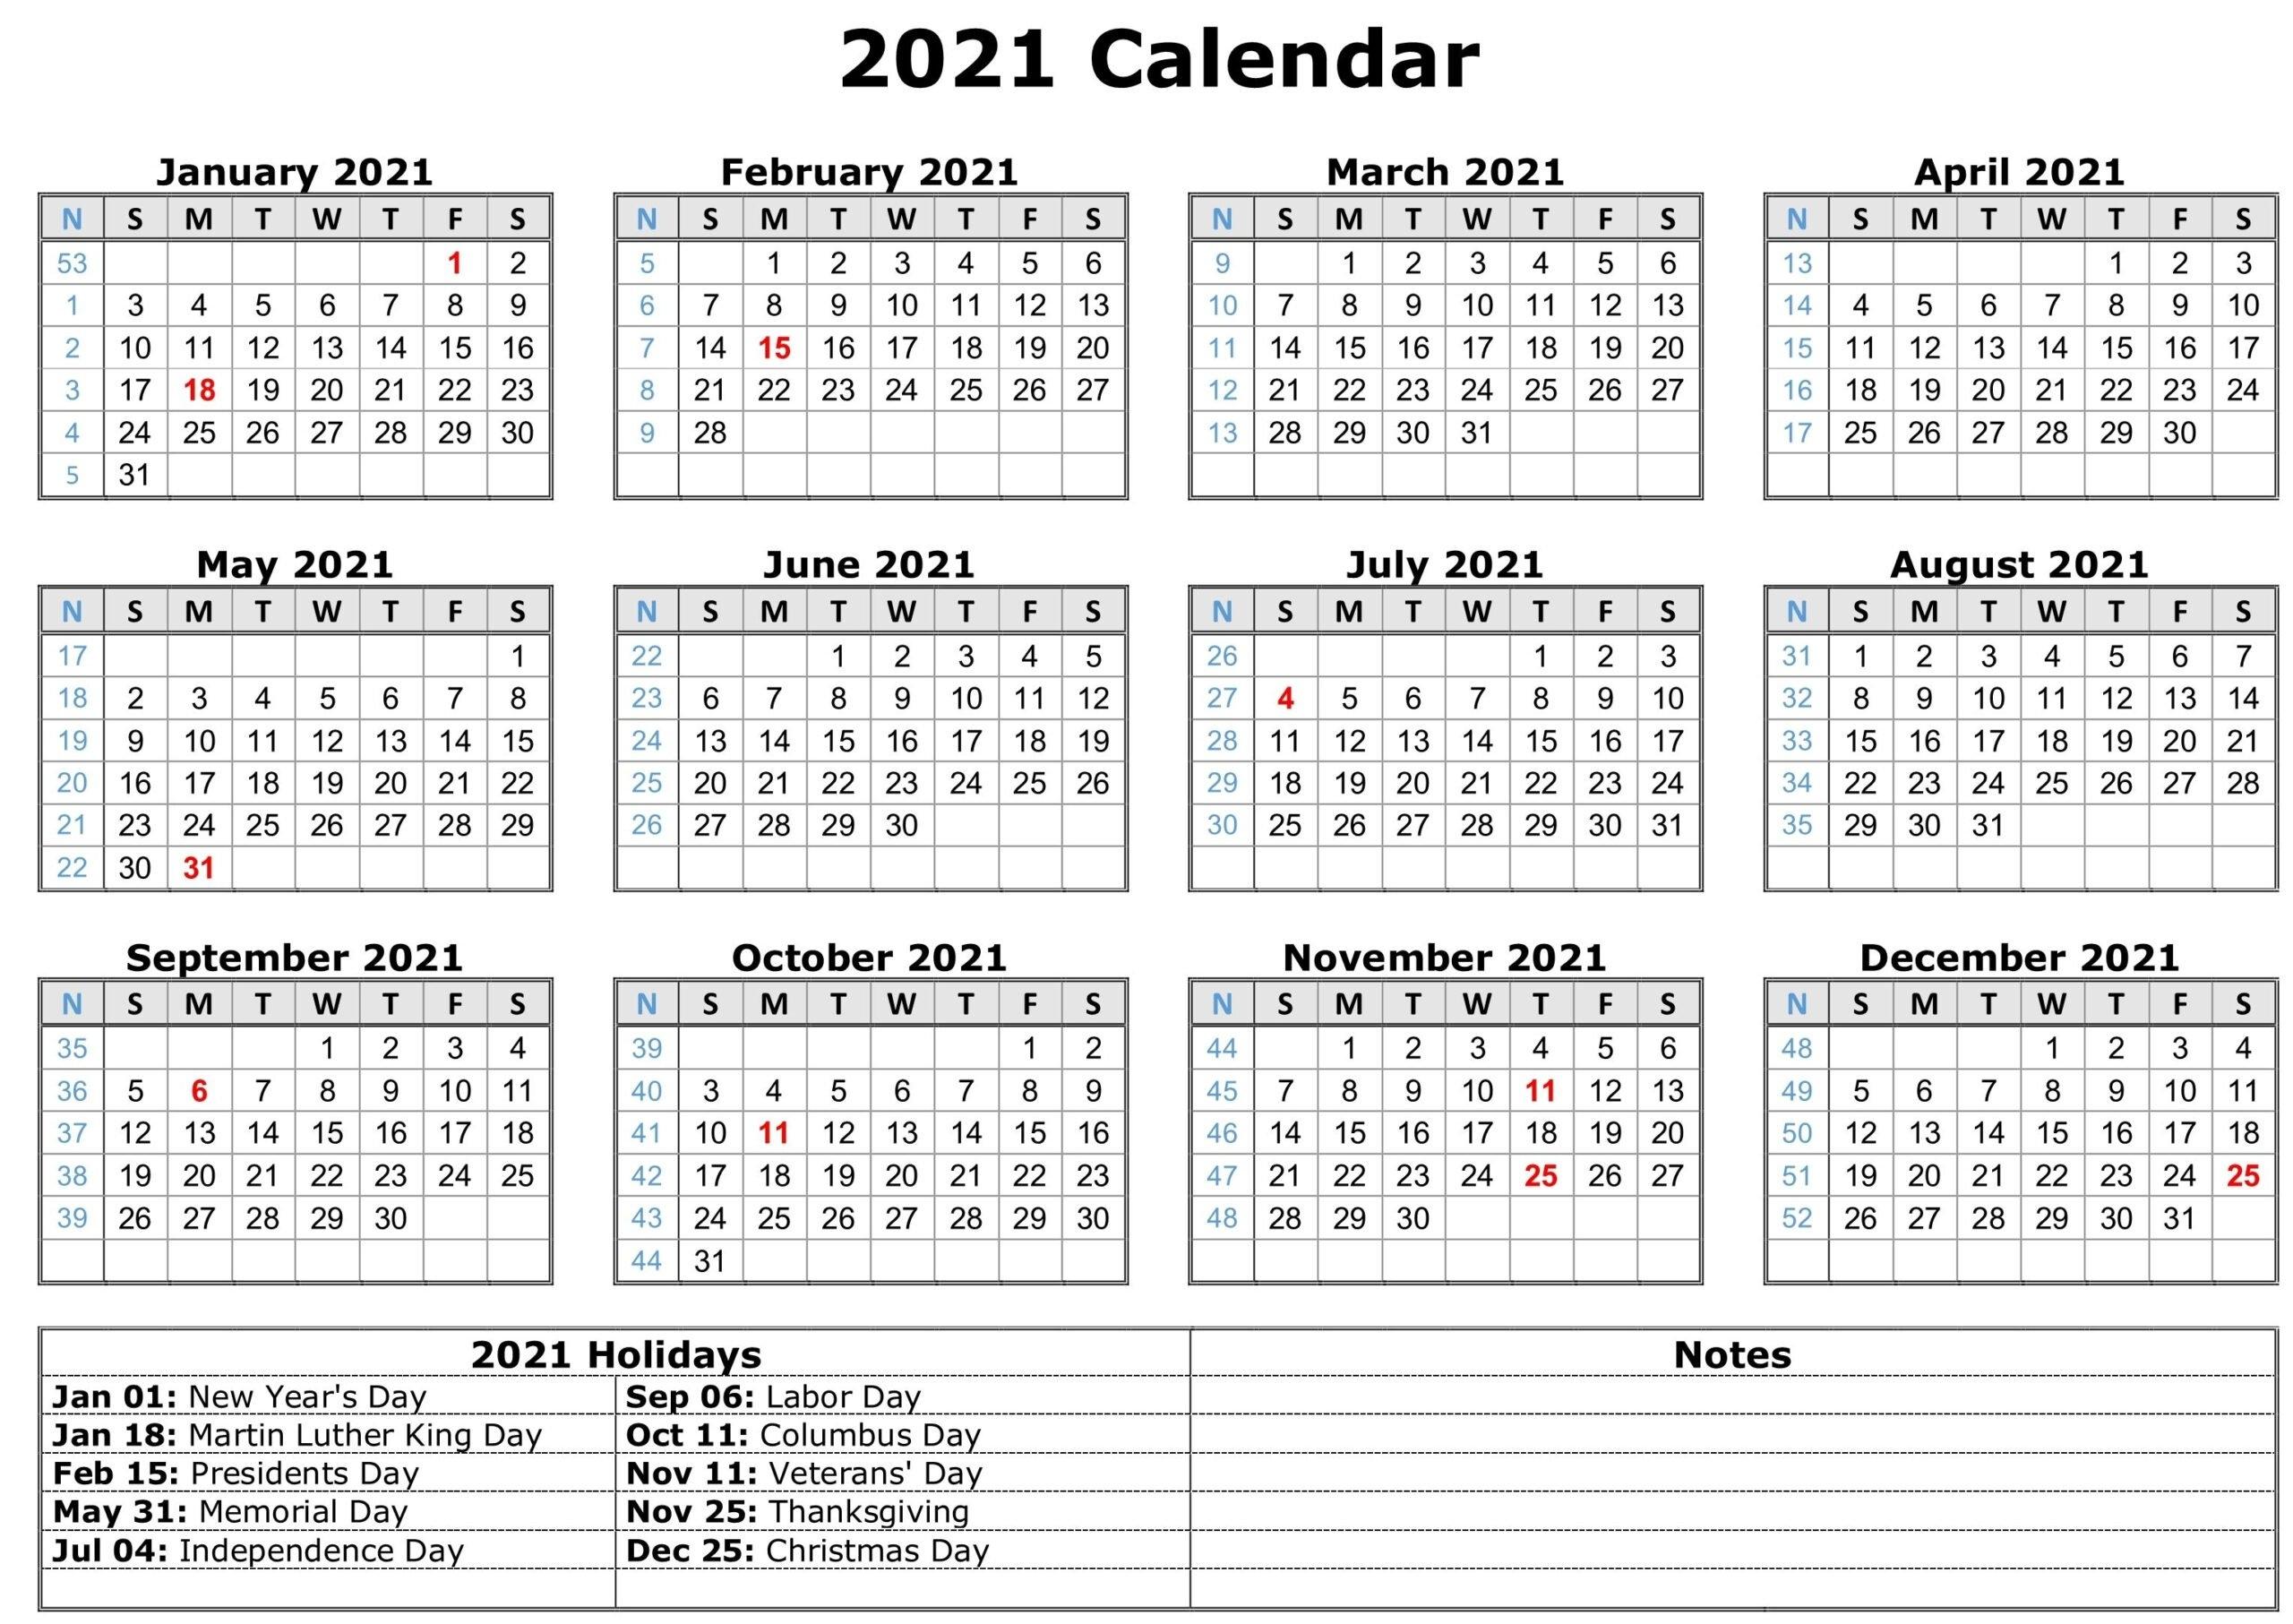 Online Free Printable Calendar 2021 | Calendar Printables Free Blank throughout 2021 Calendar Printable Free